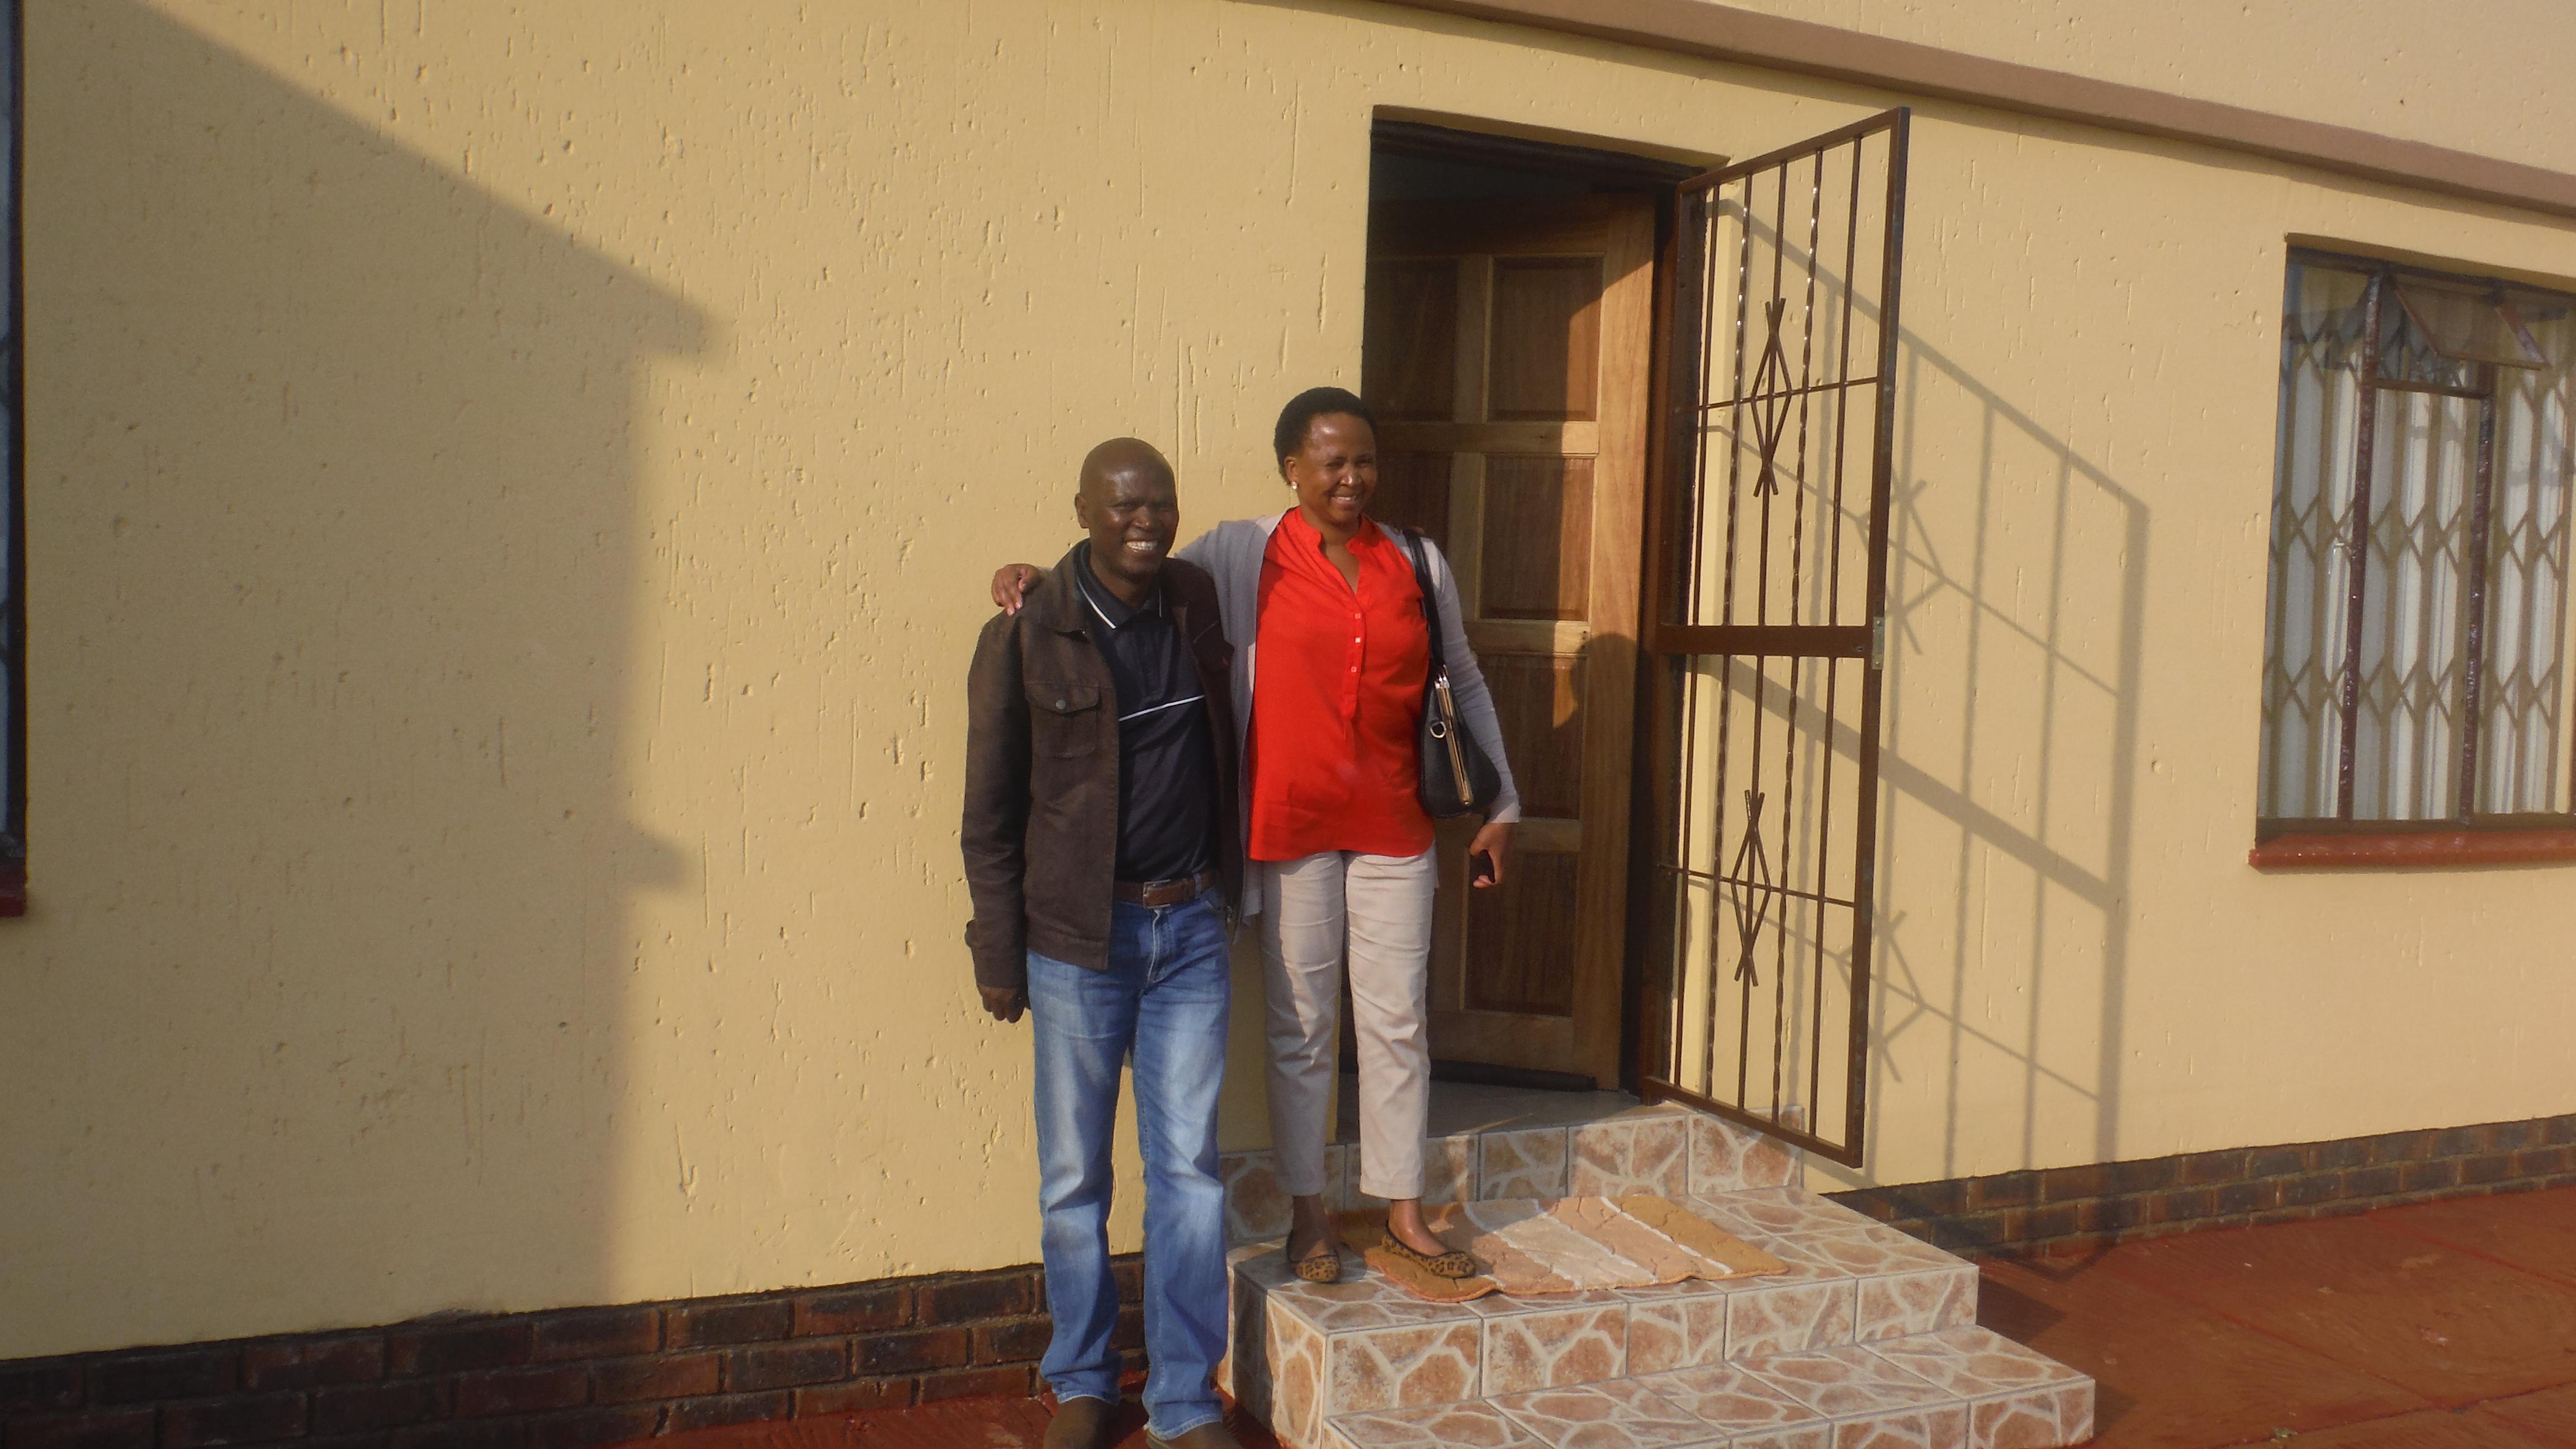 Pastor & Mrs. Motlounge